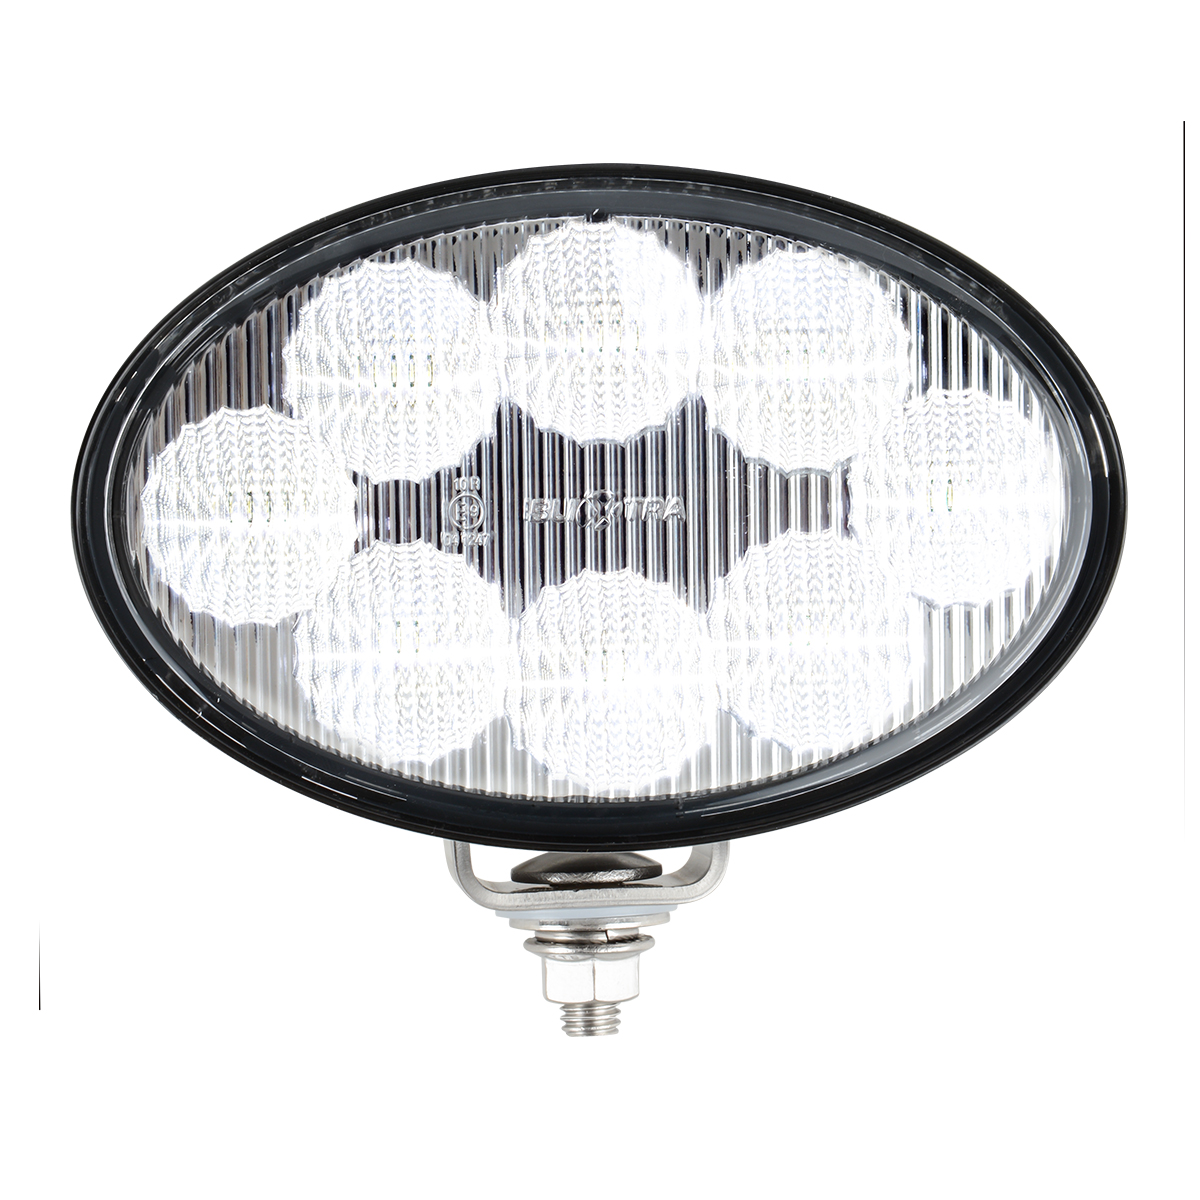 76364 Large High Power LED Flood Light